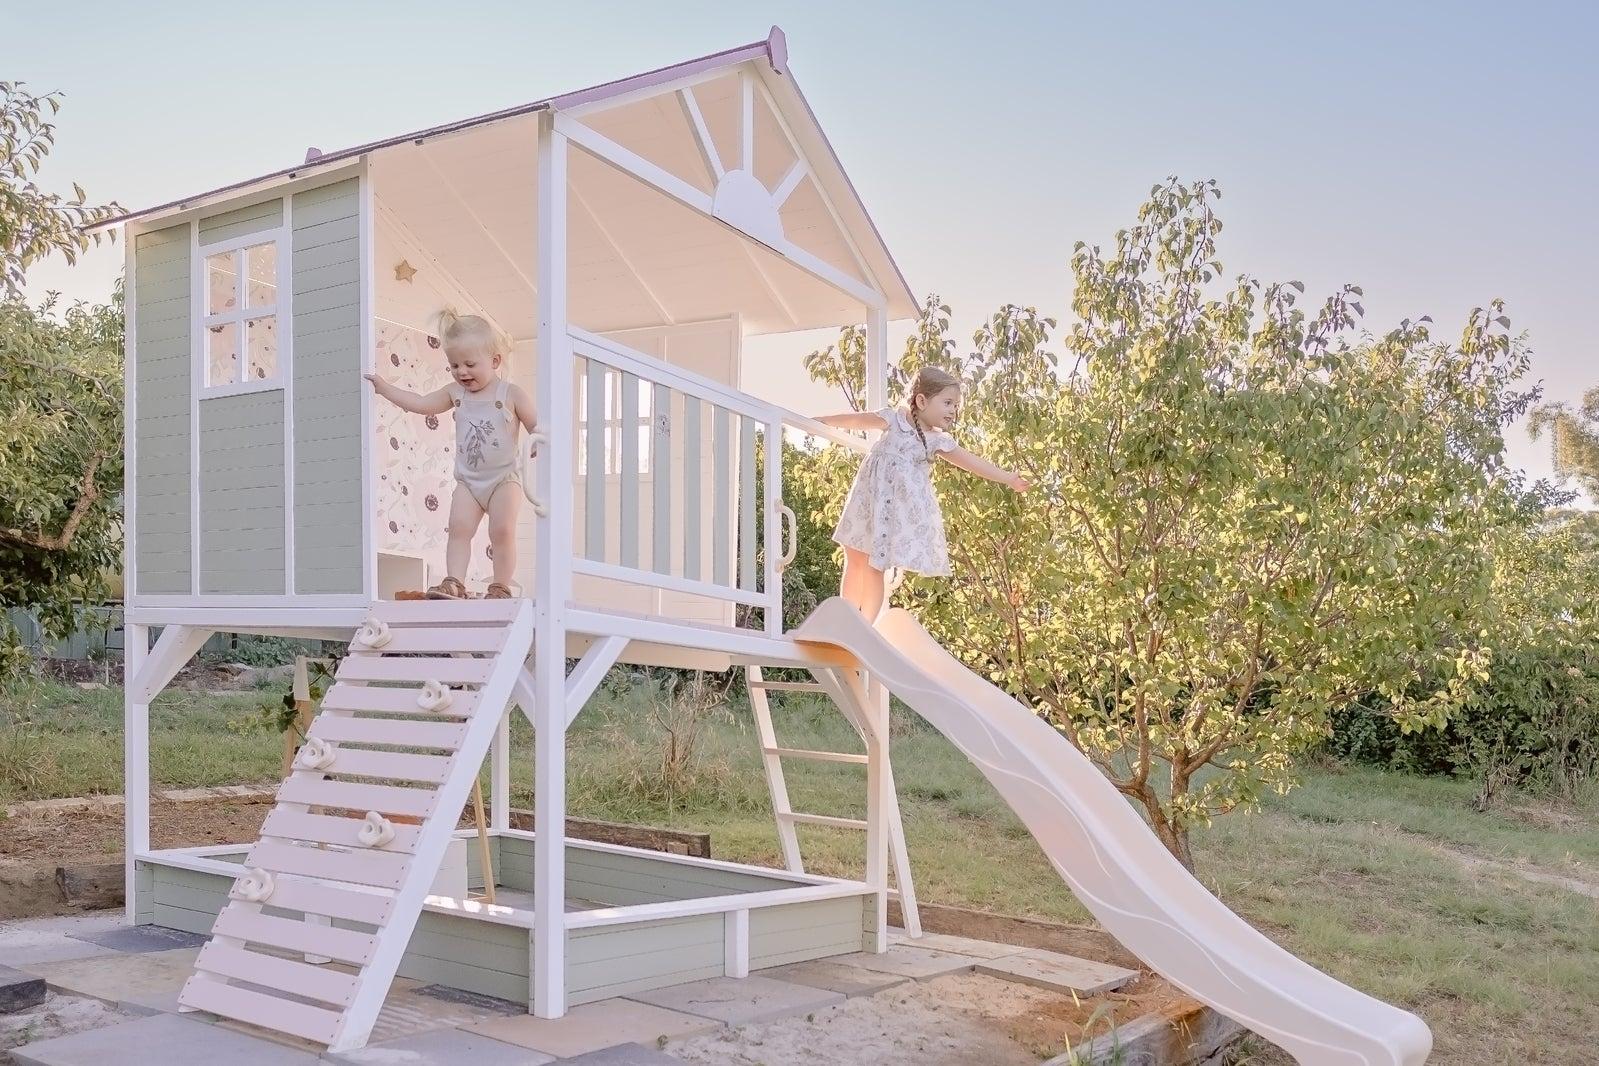 My Kidz Shack® Cubby House